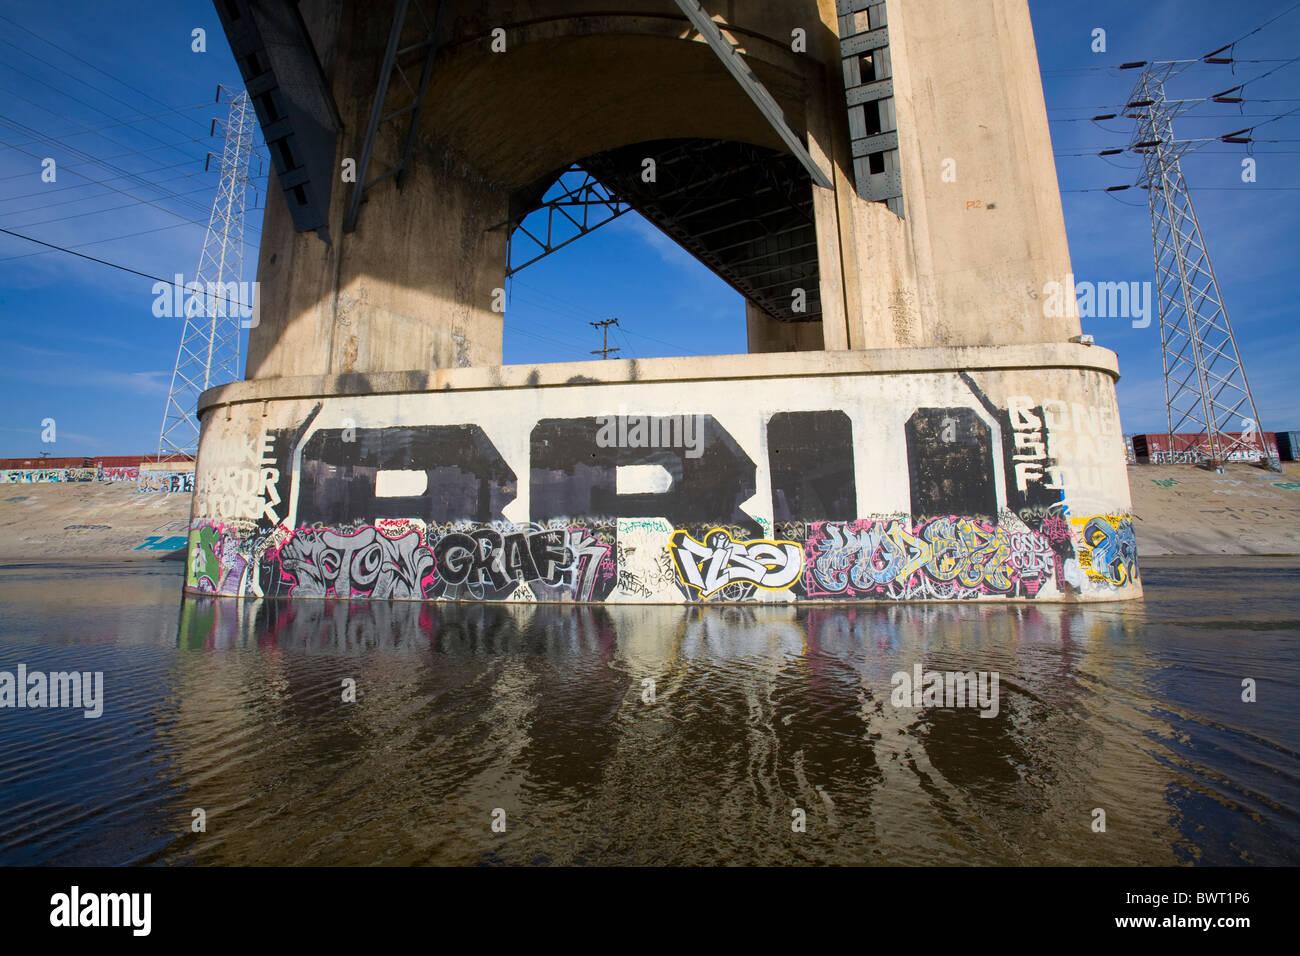 Graffiti under the 6th St Bridge, Stop on Folar's tour of the LA River, Los Angeles, California, USA - Stock Image